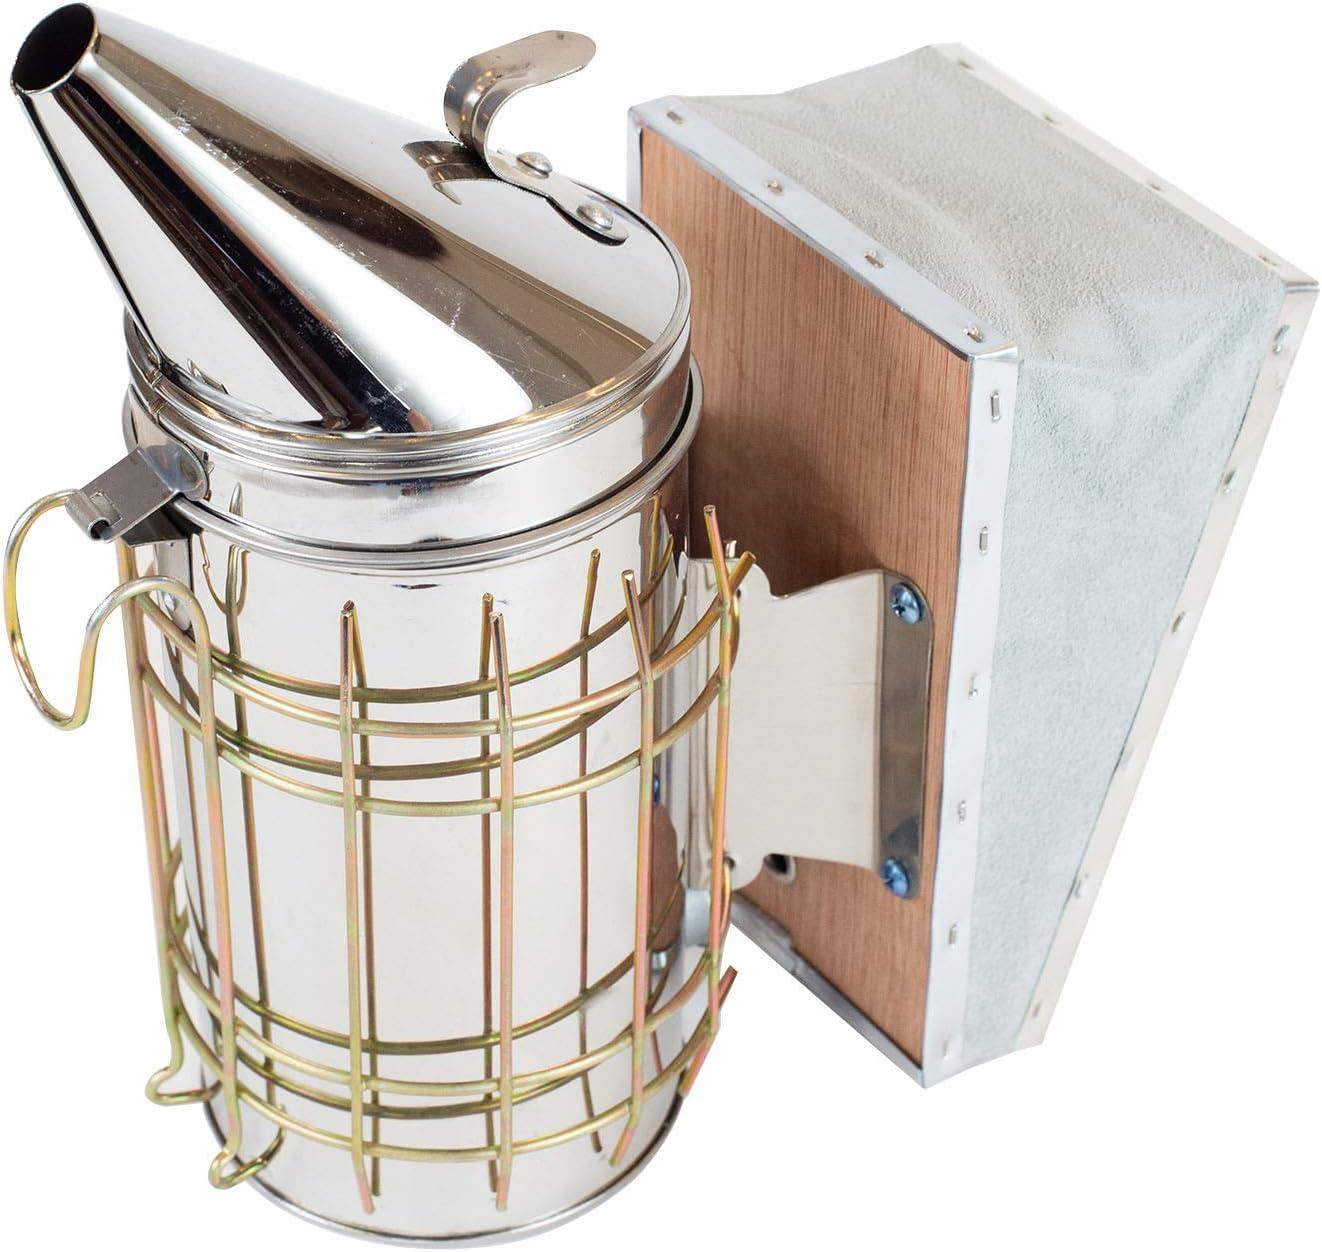 "SunVara 11"" Bee Smoker Stainless Steel with Heat Shield Beekeeping Equipment"